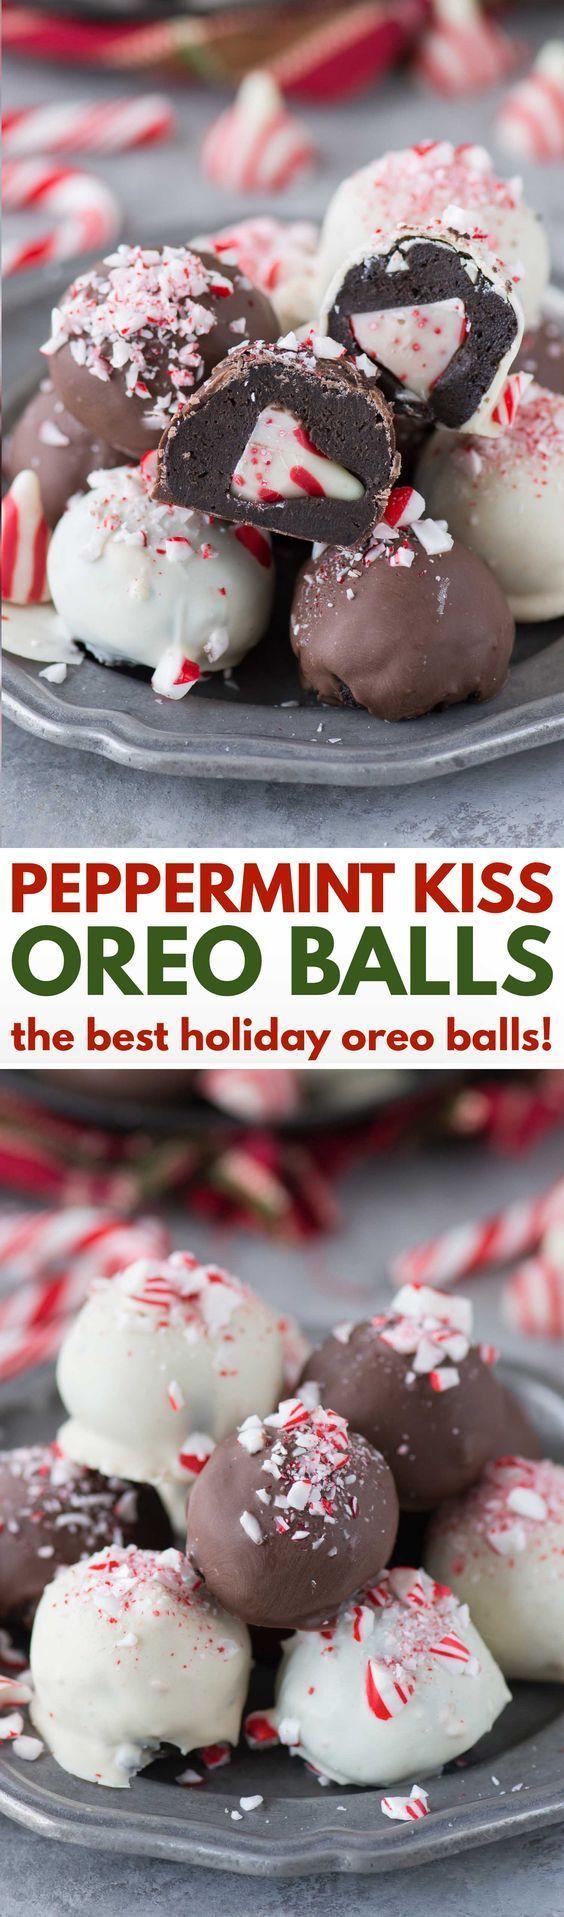 Peppermint Kiss Oreo Balls | Recipe